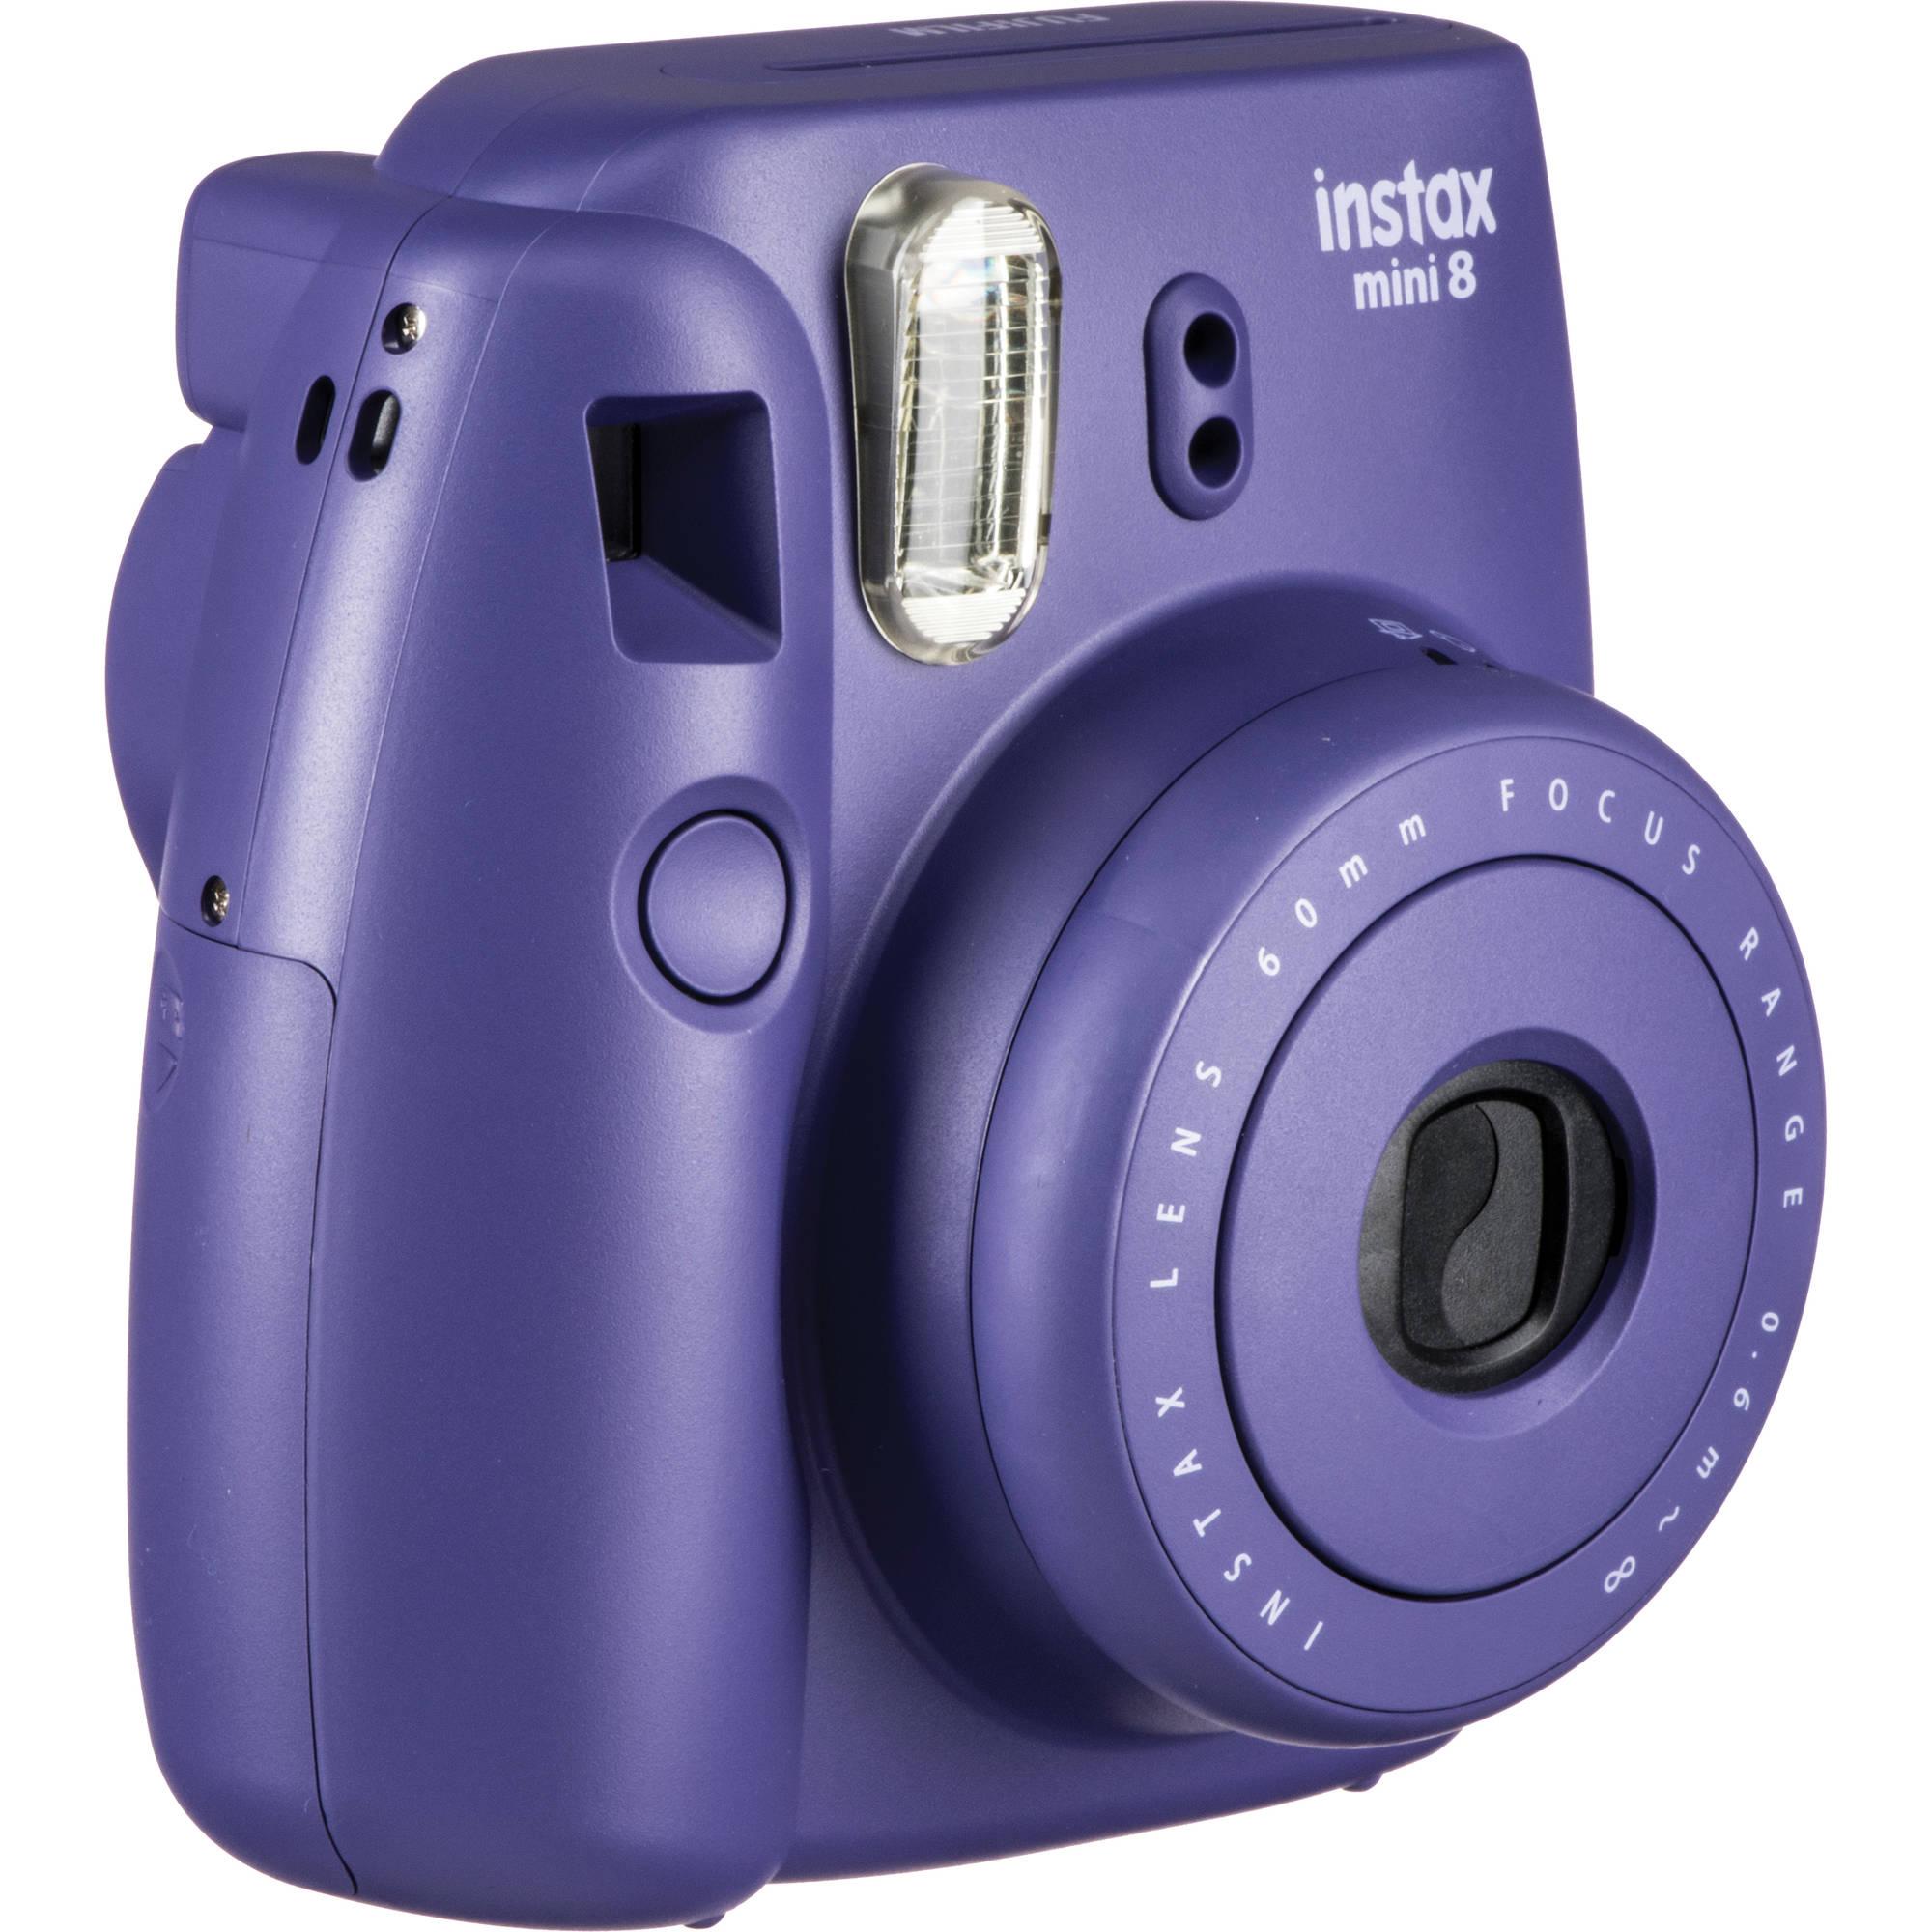 Fuji instax mini 8 instant photo camera grape purple w 20 for Instax mini 8 housse